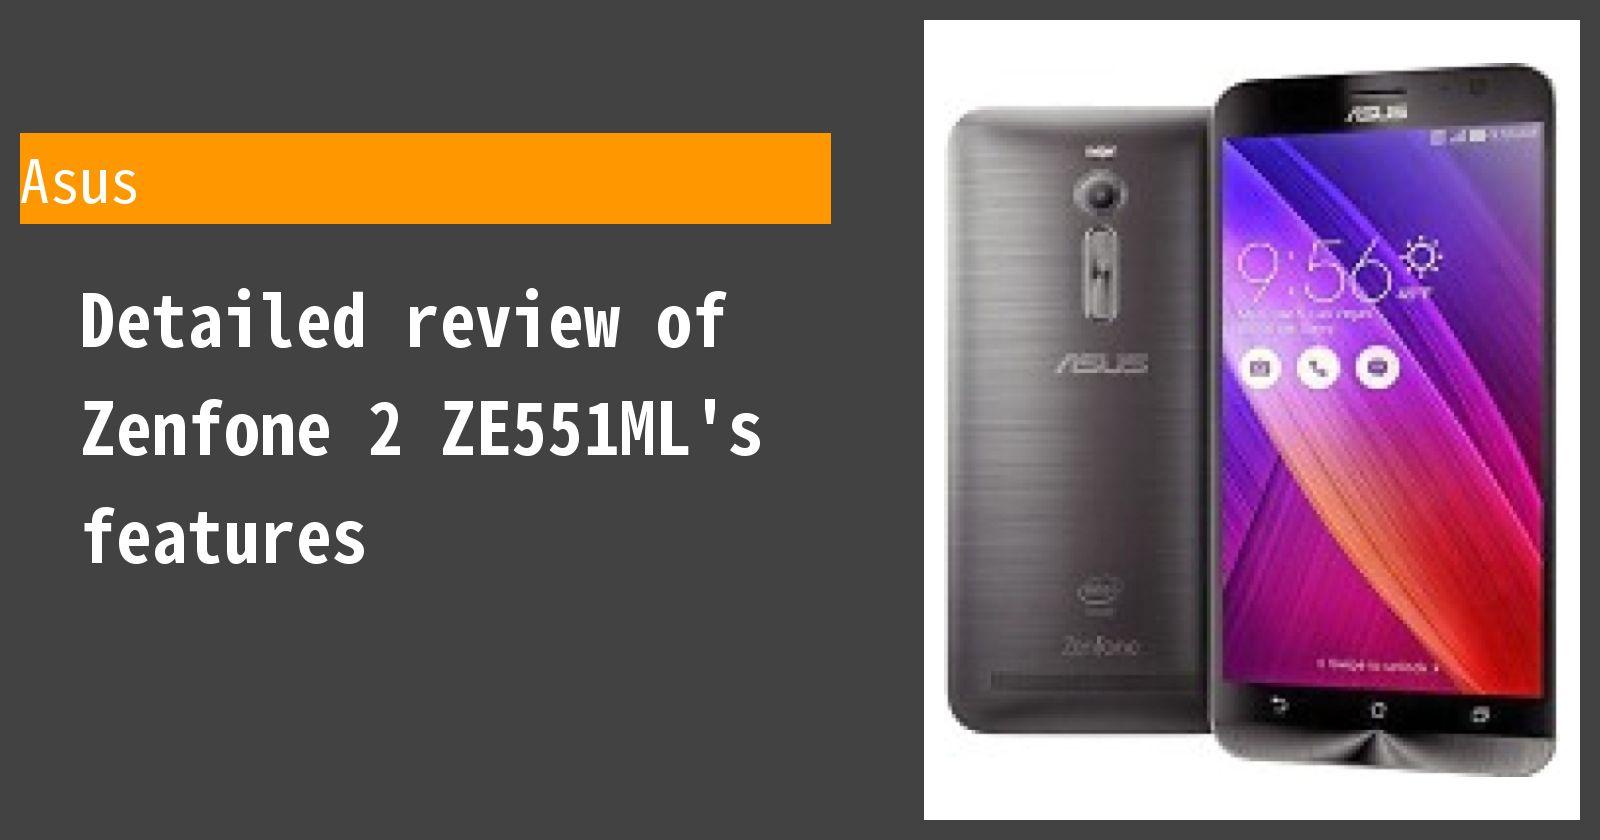 Detailed review of Zenfone 2 ZE551ML's features